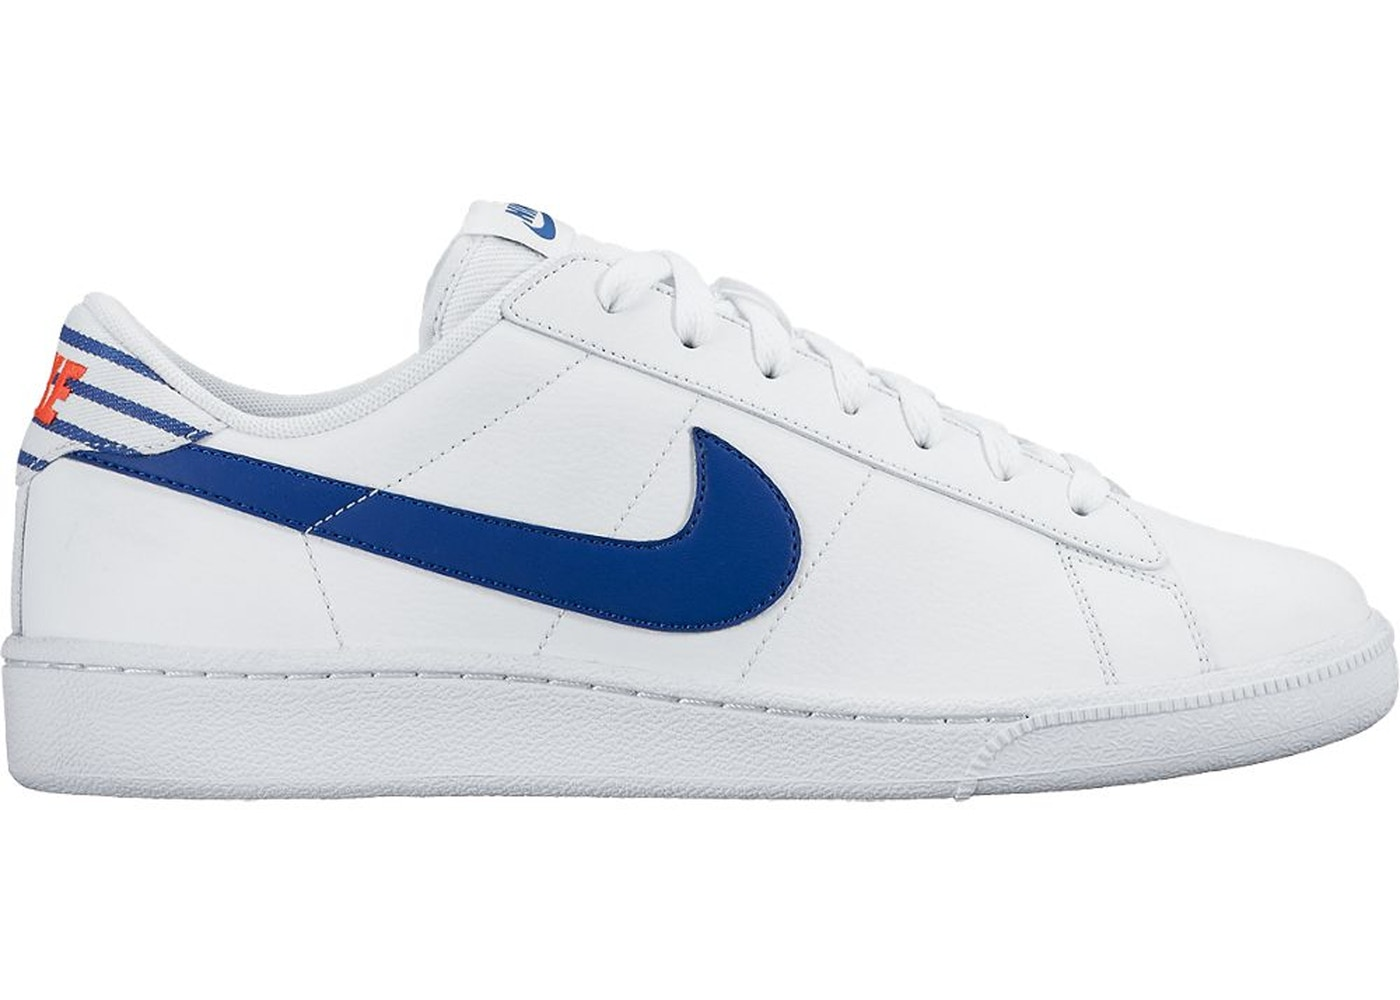 new arrival 0fc62 9263f Nike Tennis Classic CS White Gym Blue